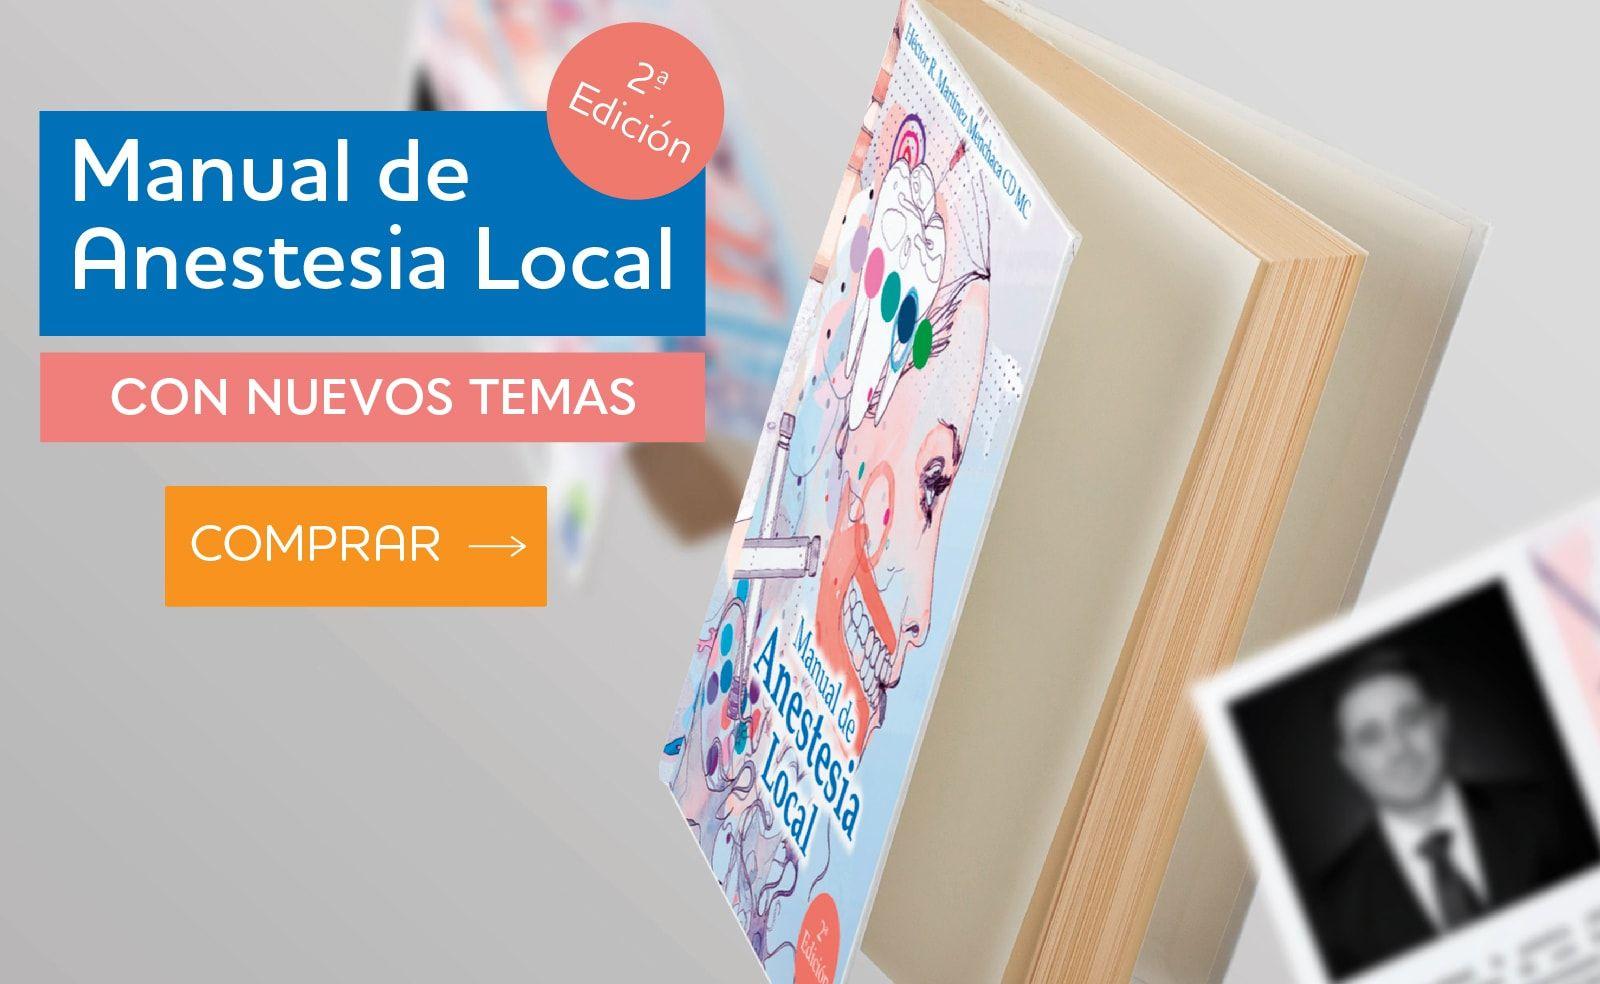 Manual de Anestesia Local materiales dentales Home tesar regular 100 min